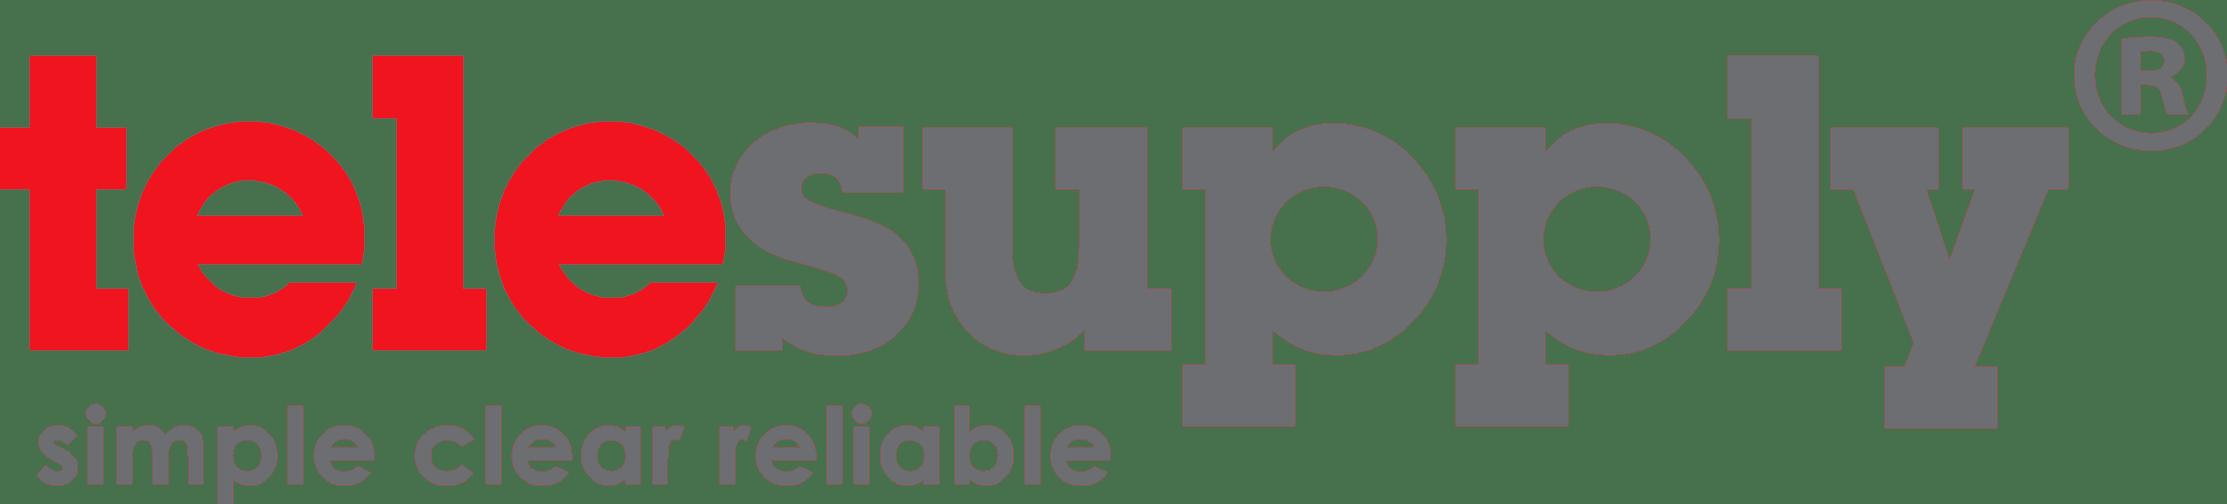 TeleSupply